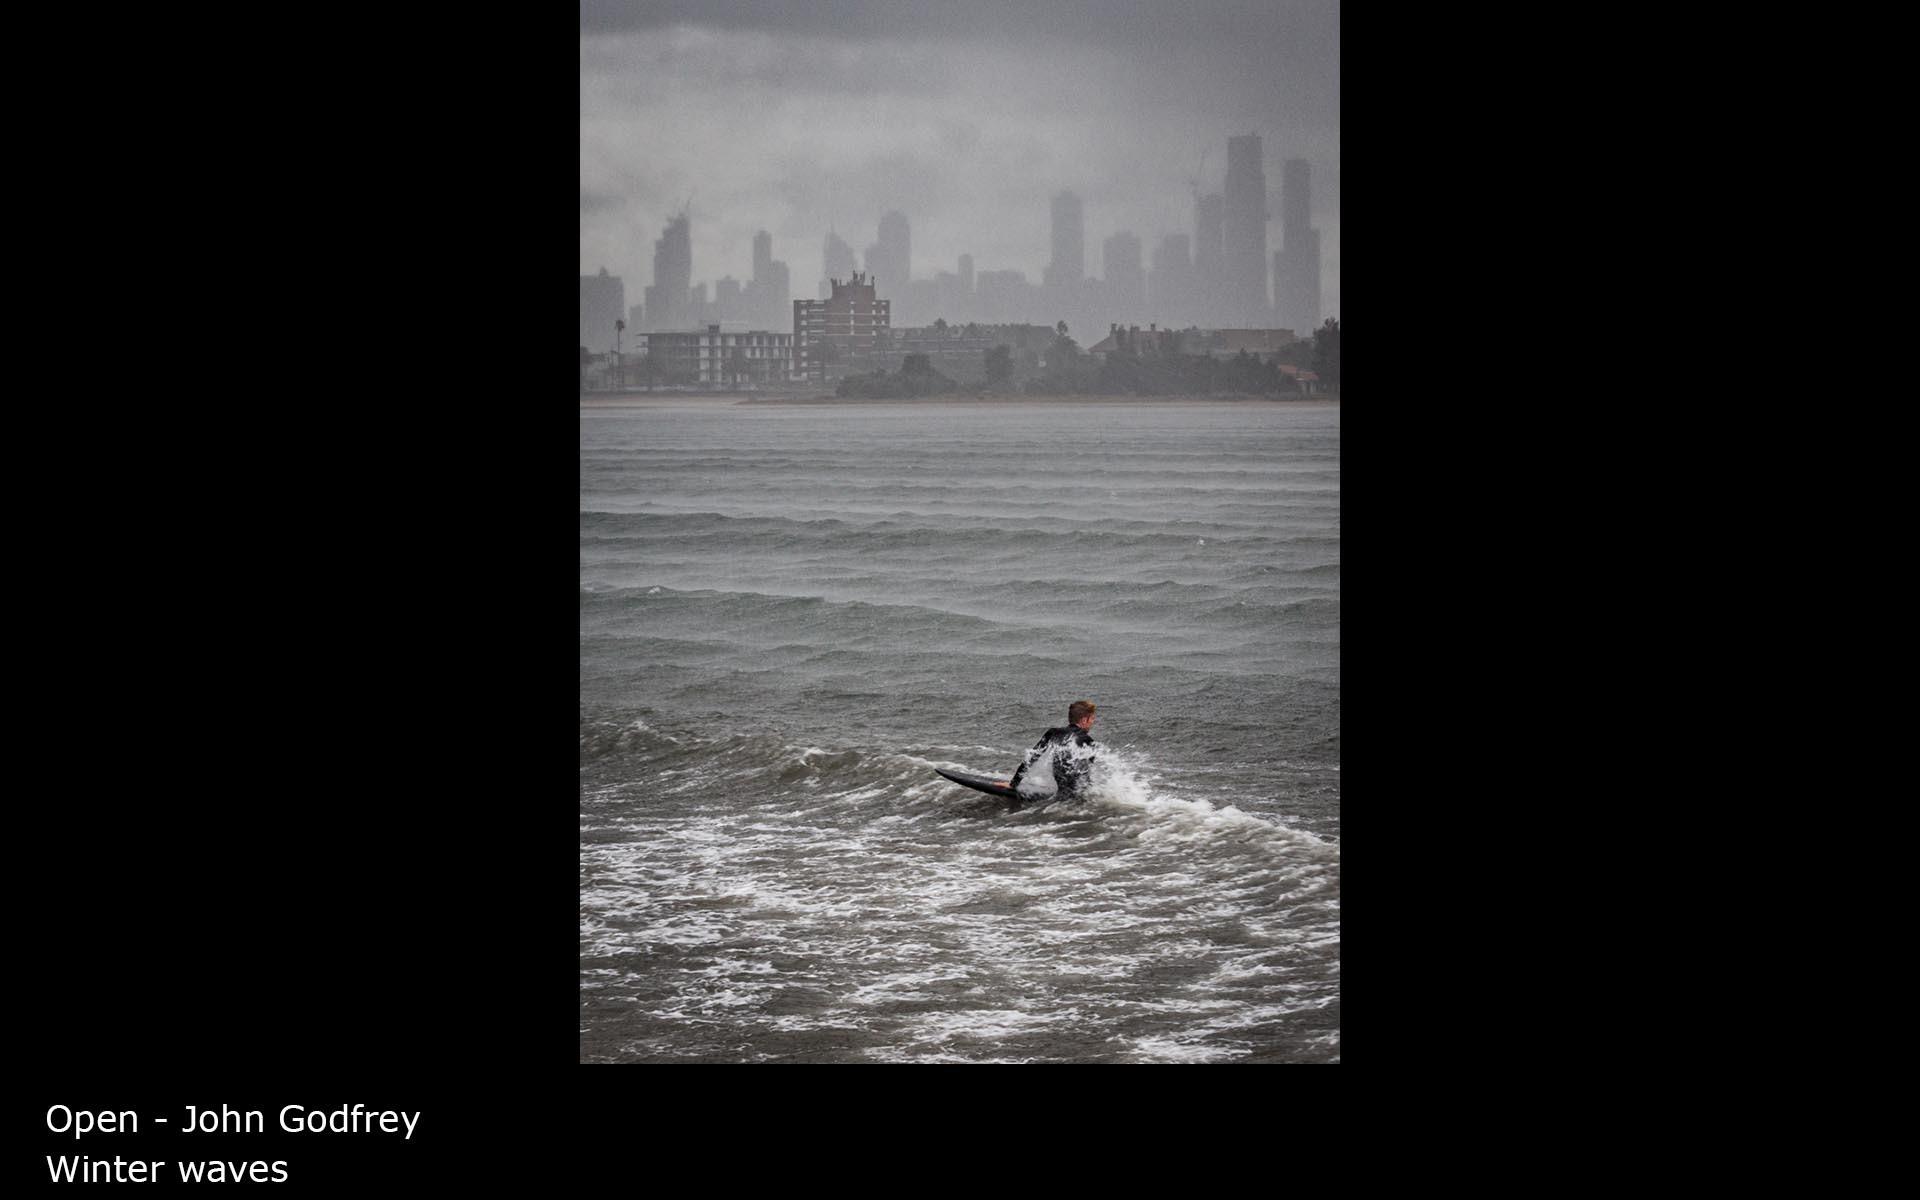 Winter waves - John Godfrey